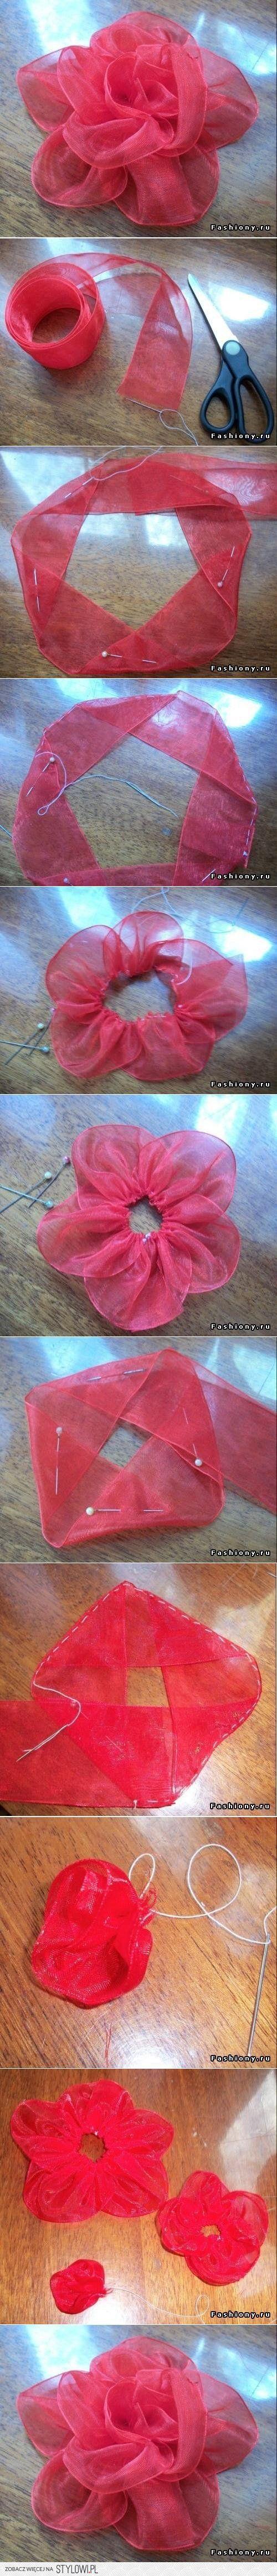 DIY Ribbon Tape Flower DIY Projects | UsefulDIY.com na Stylowi.pl